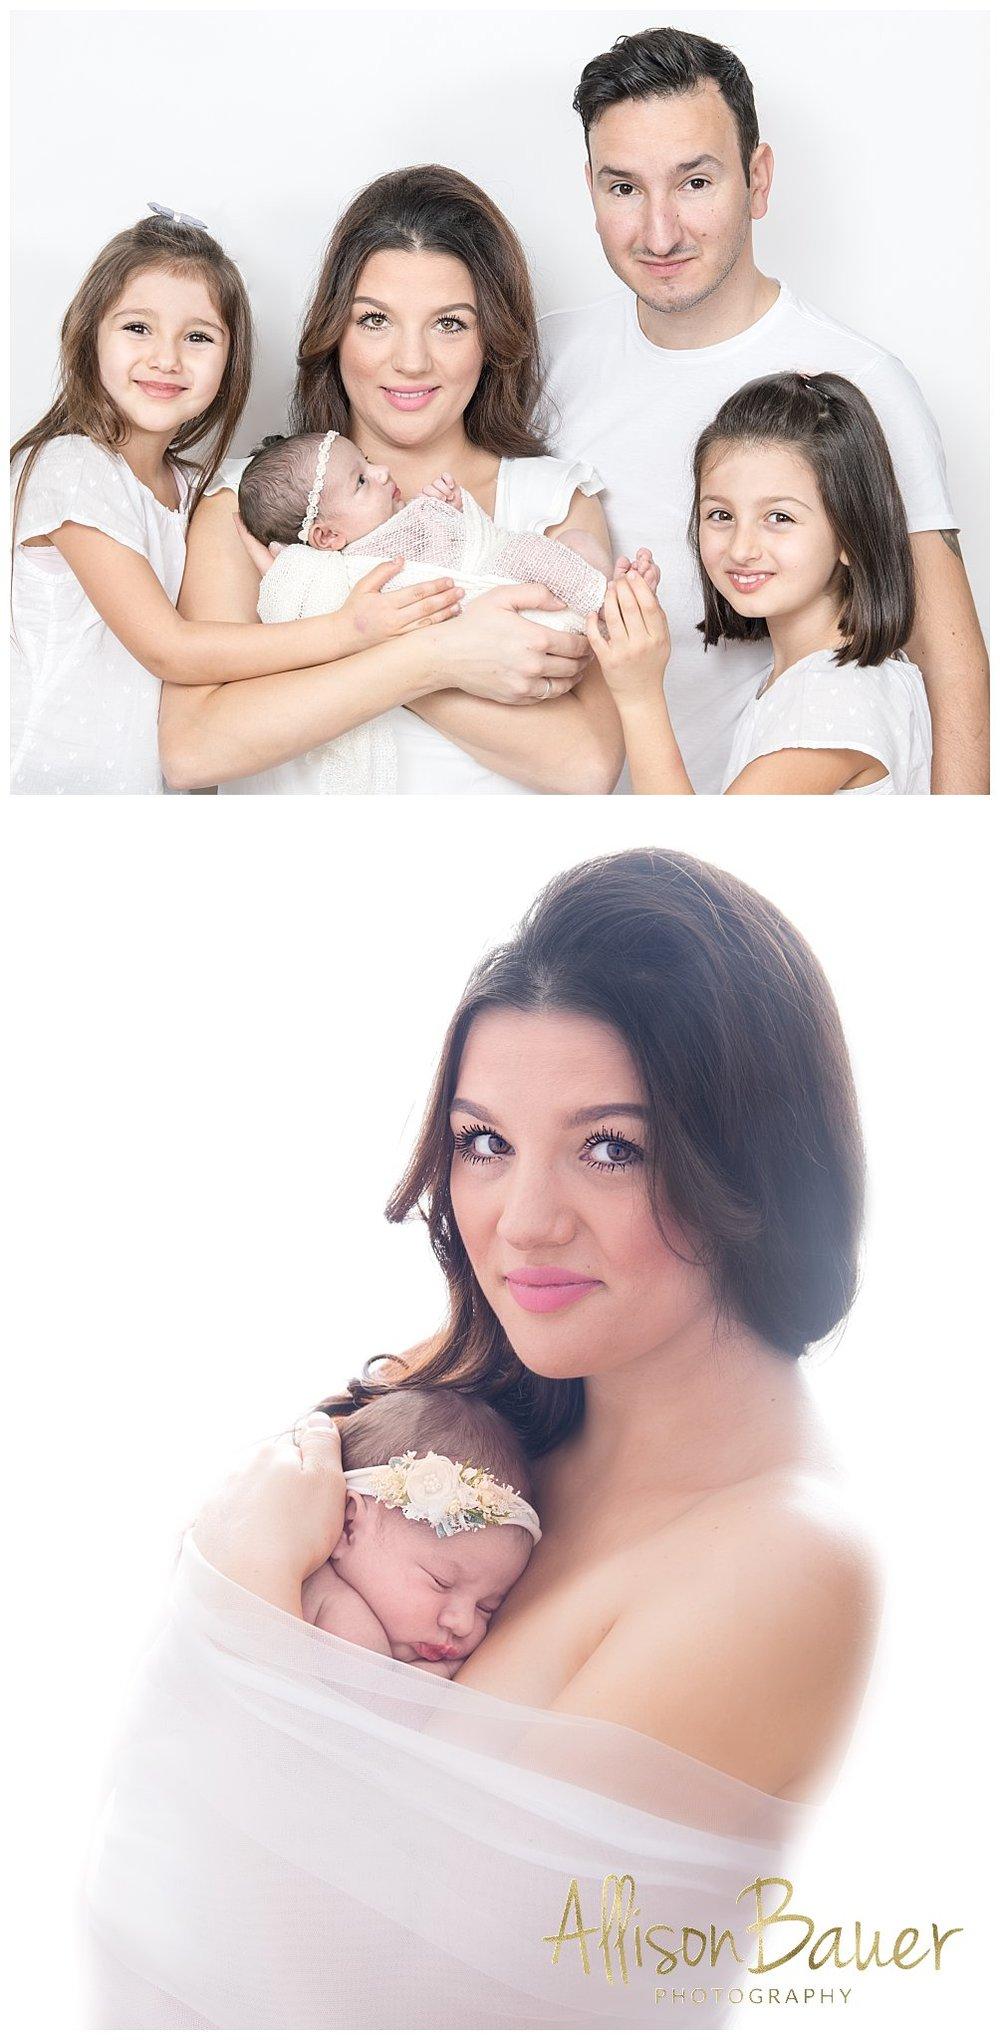 Allison-Bauer-babyfotos-Familienfotos